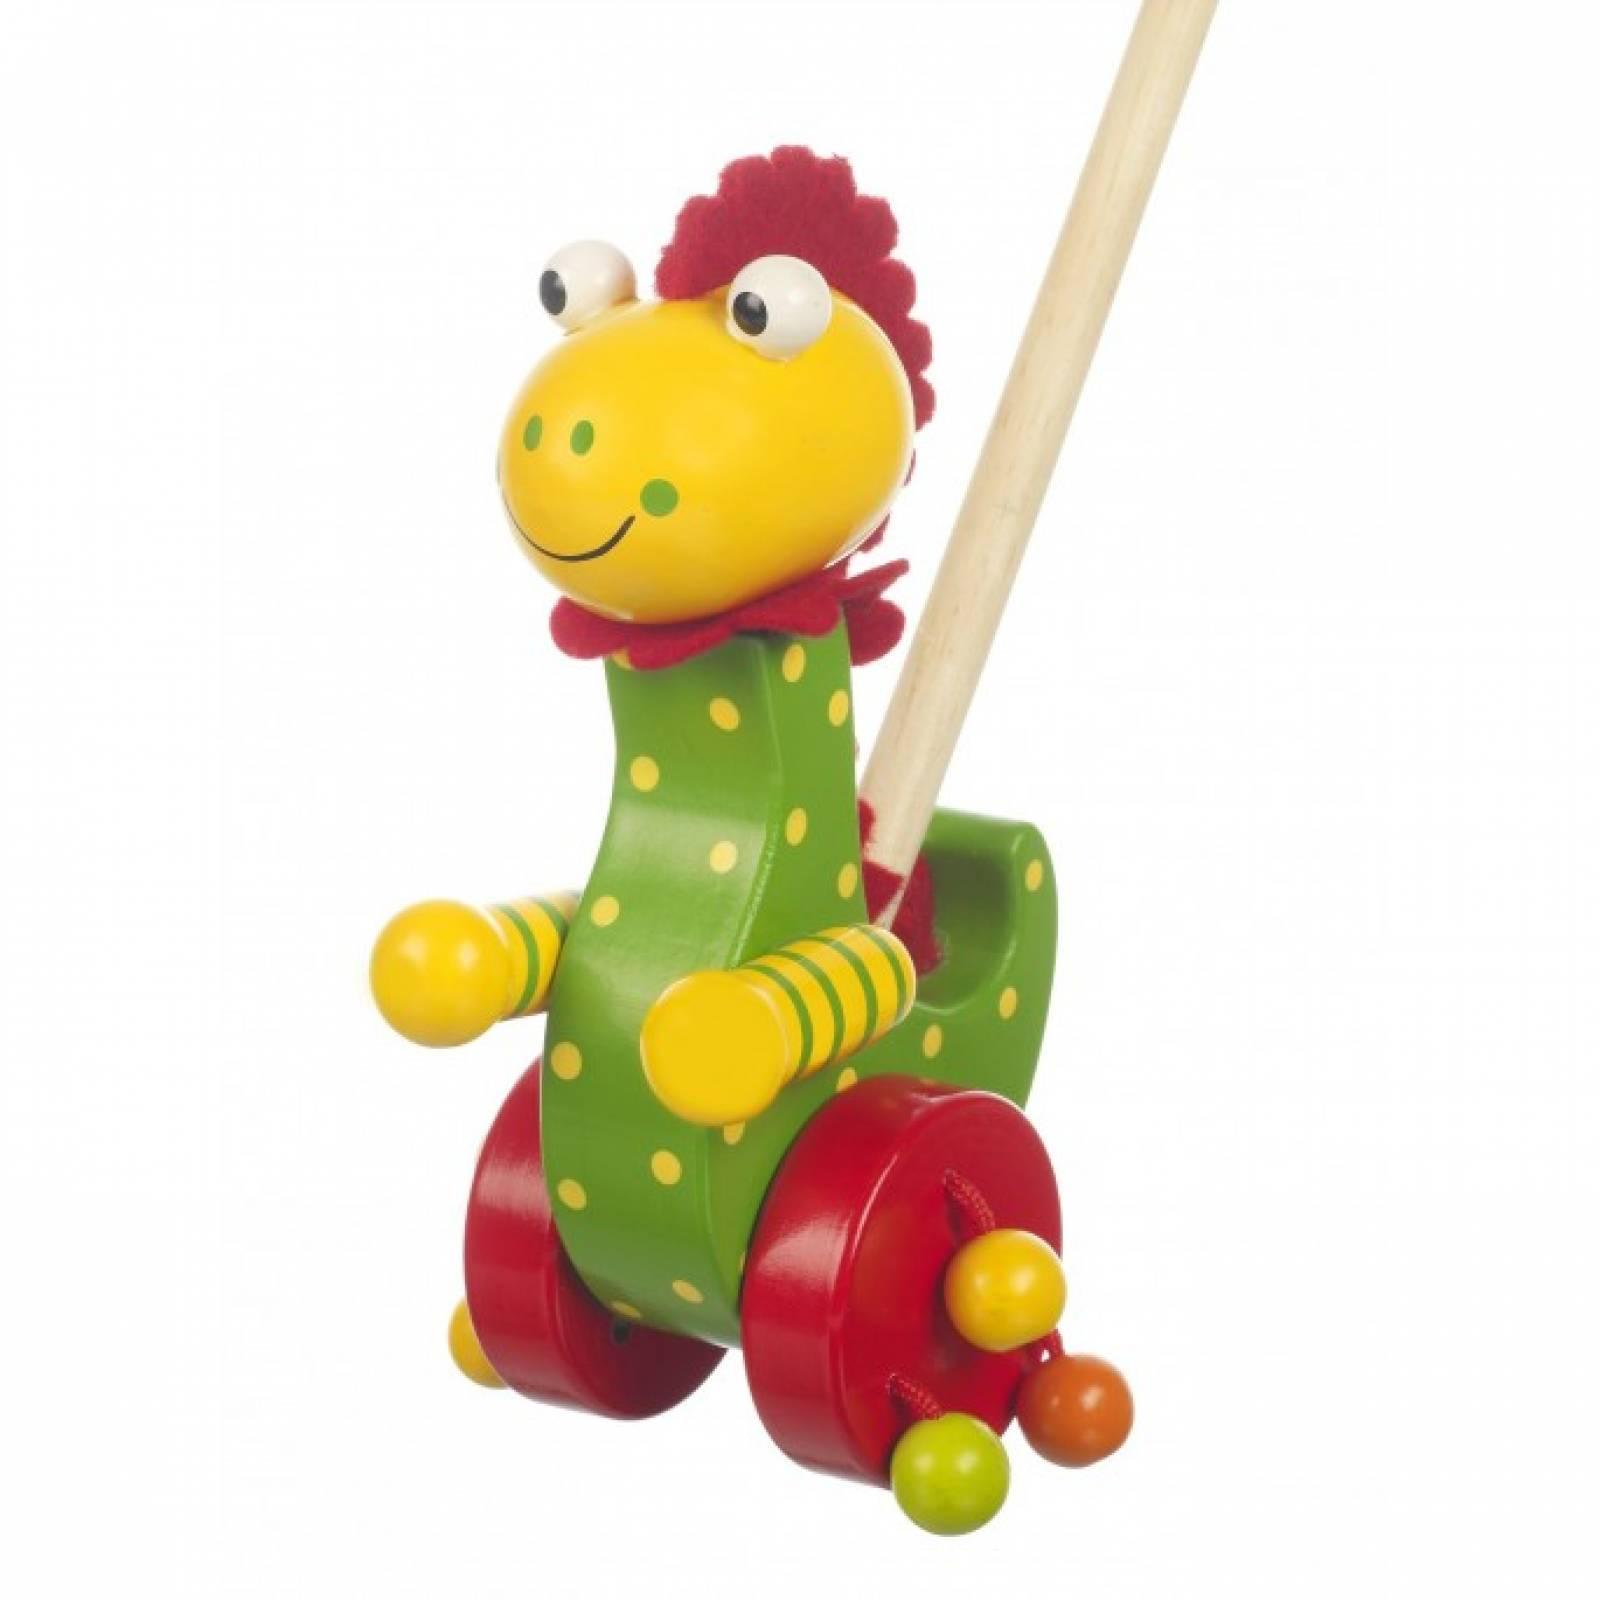 Dinosaur Push Along Toy By Orange Tree 12mth+ thumbnails